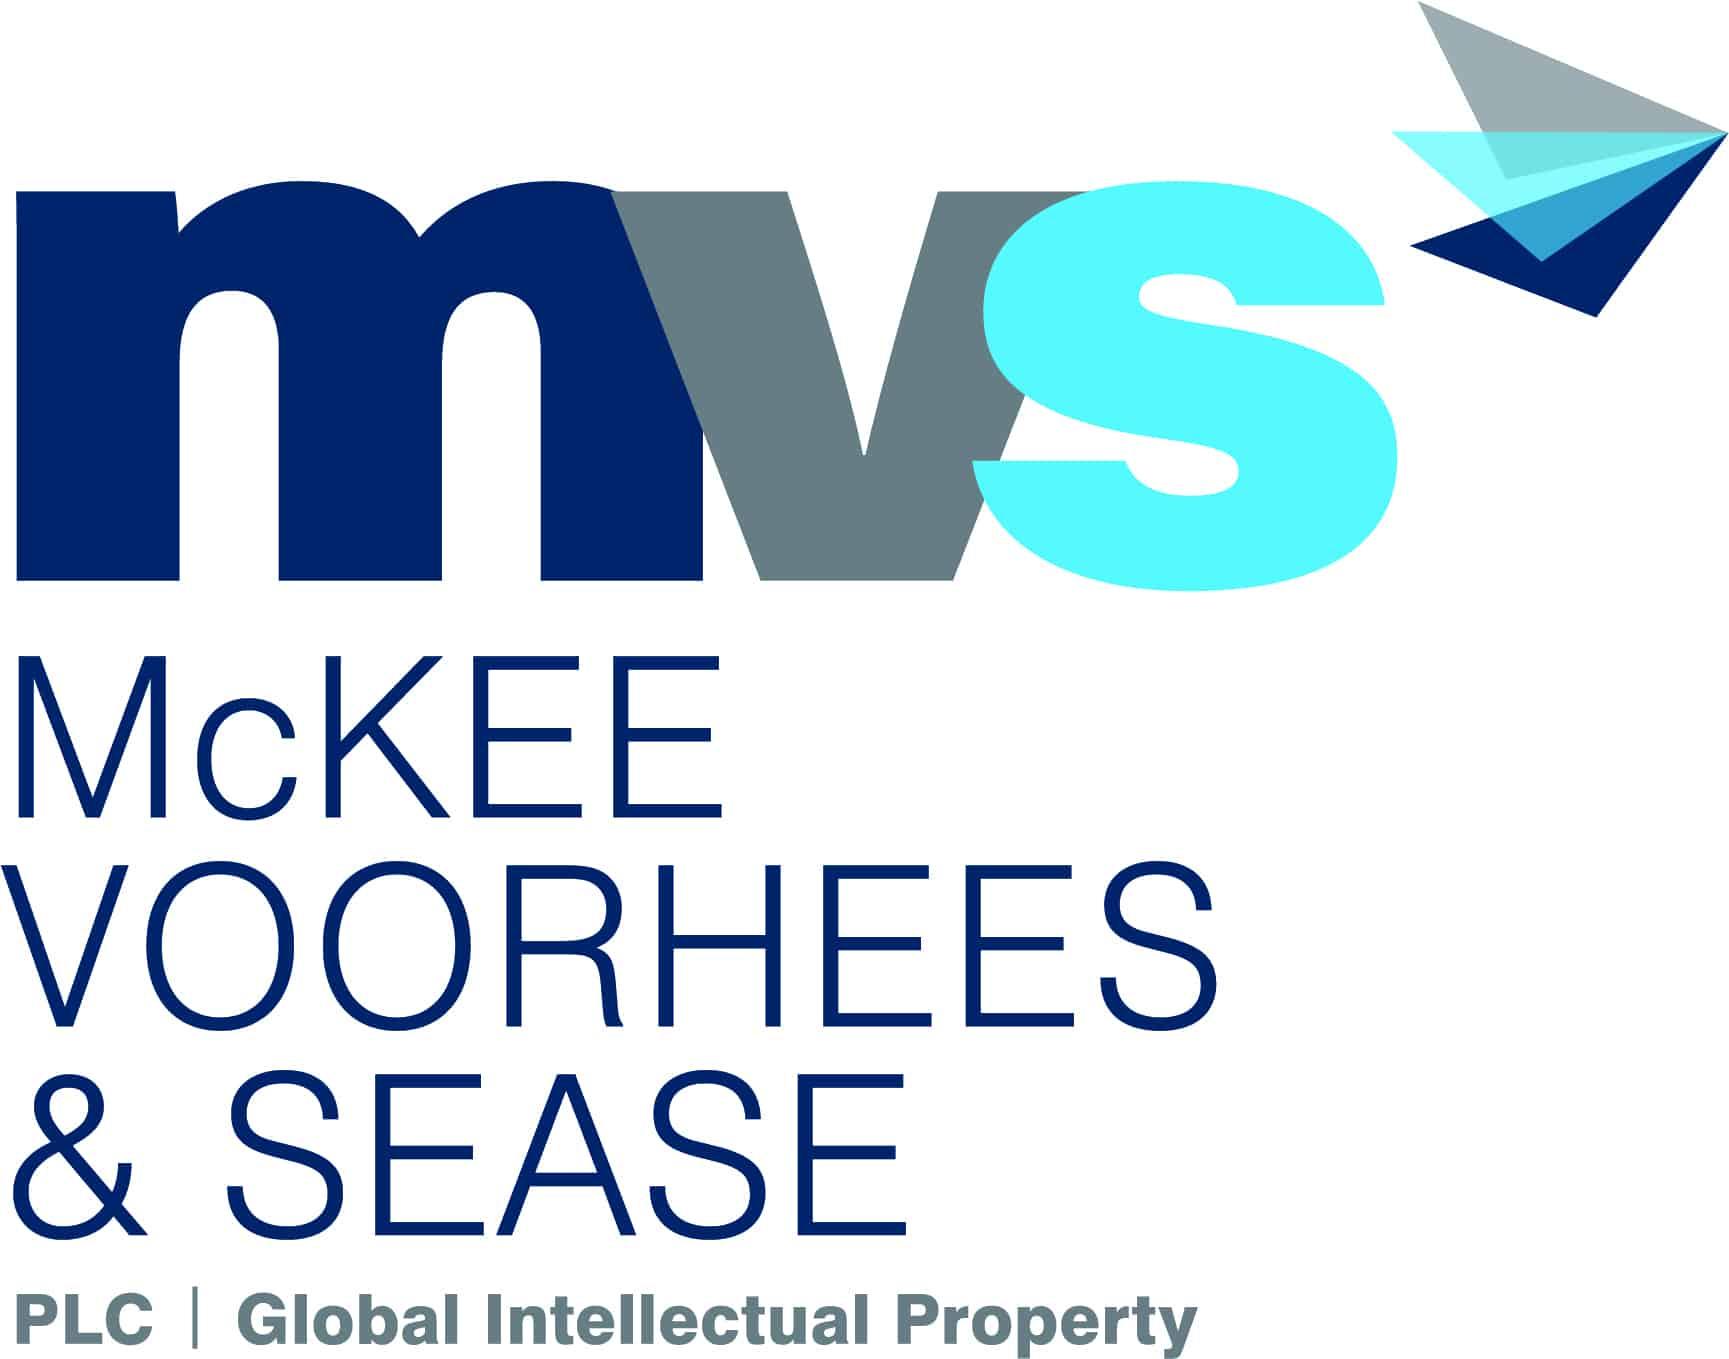 MVS_logo_FINAL-full-CMYK